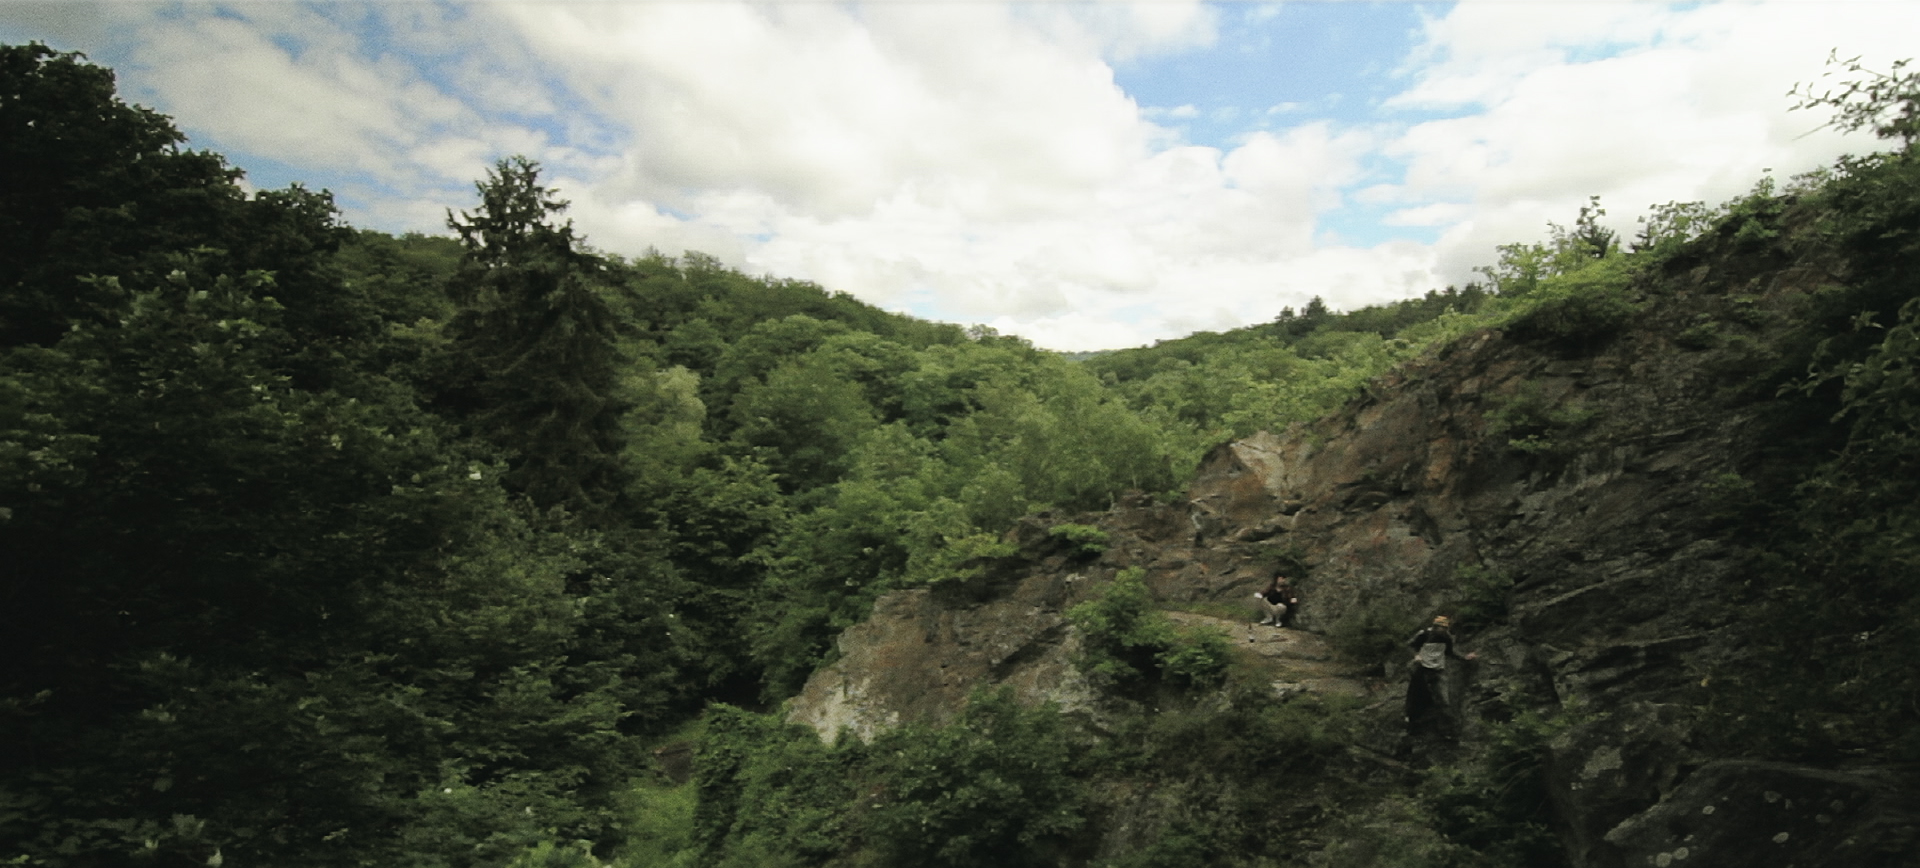 wiesersehen-screenshot-04